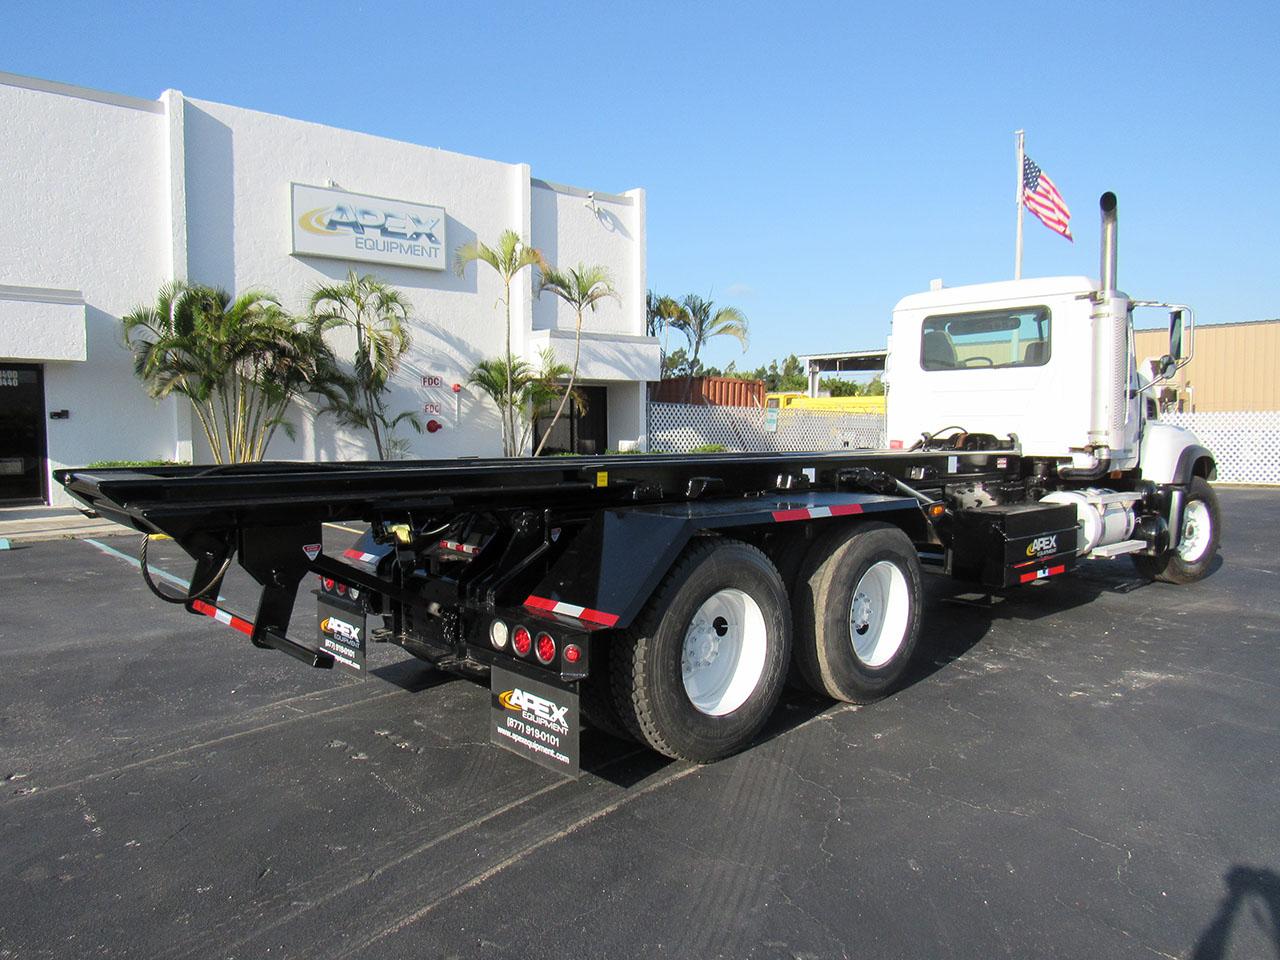 used 2005 Mack CV713 in West Palm Beach, FL